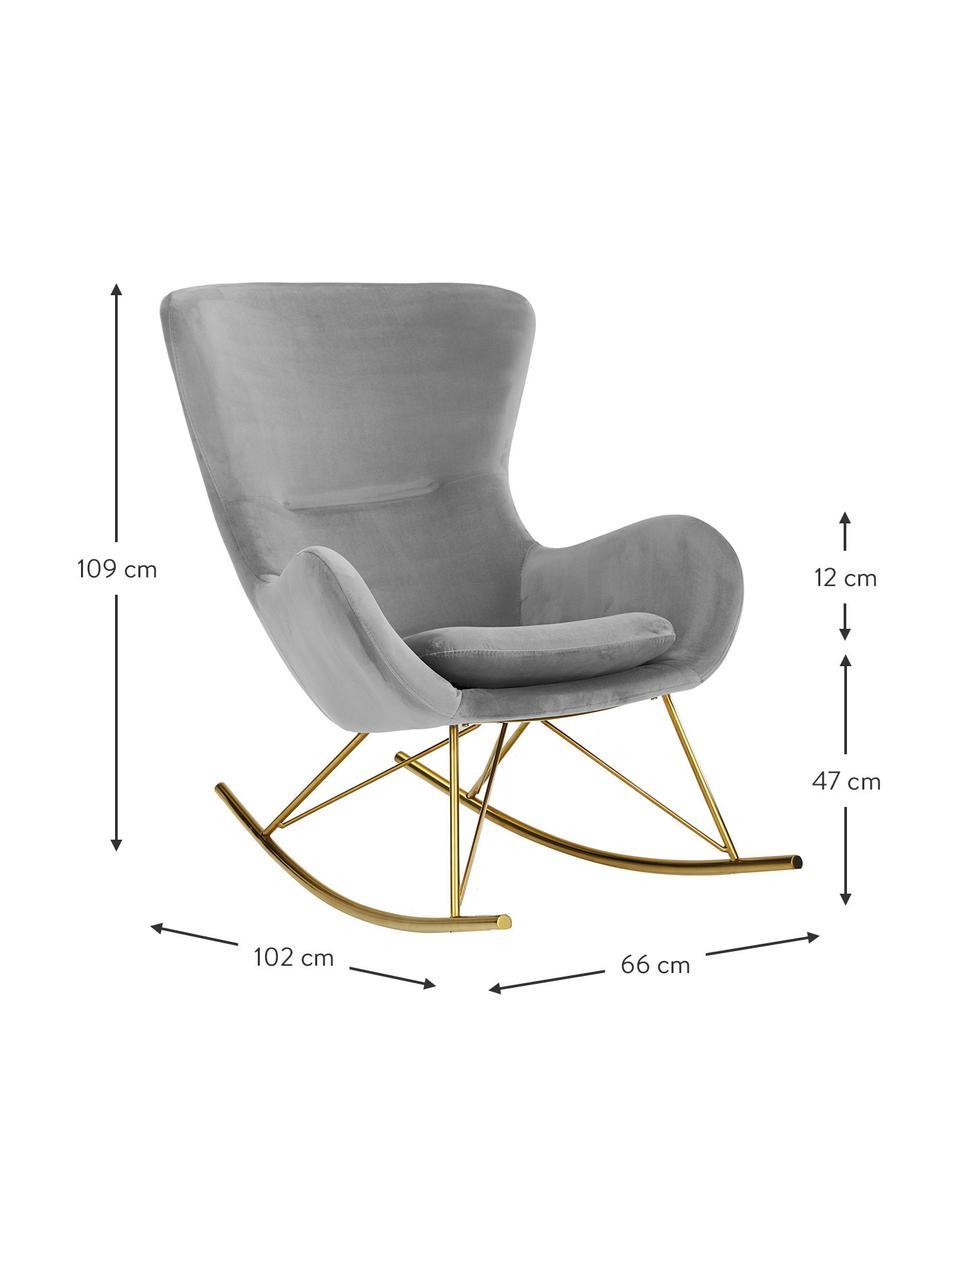 Samt-Schaukelstuhl Wing in Grau, Bezug: Samt (Polyester) Der Bezu, Gestell: Metall, galvanisiert, Samt Grau, Goldfarben, B 66 x T 102 cm